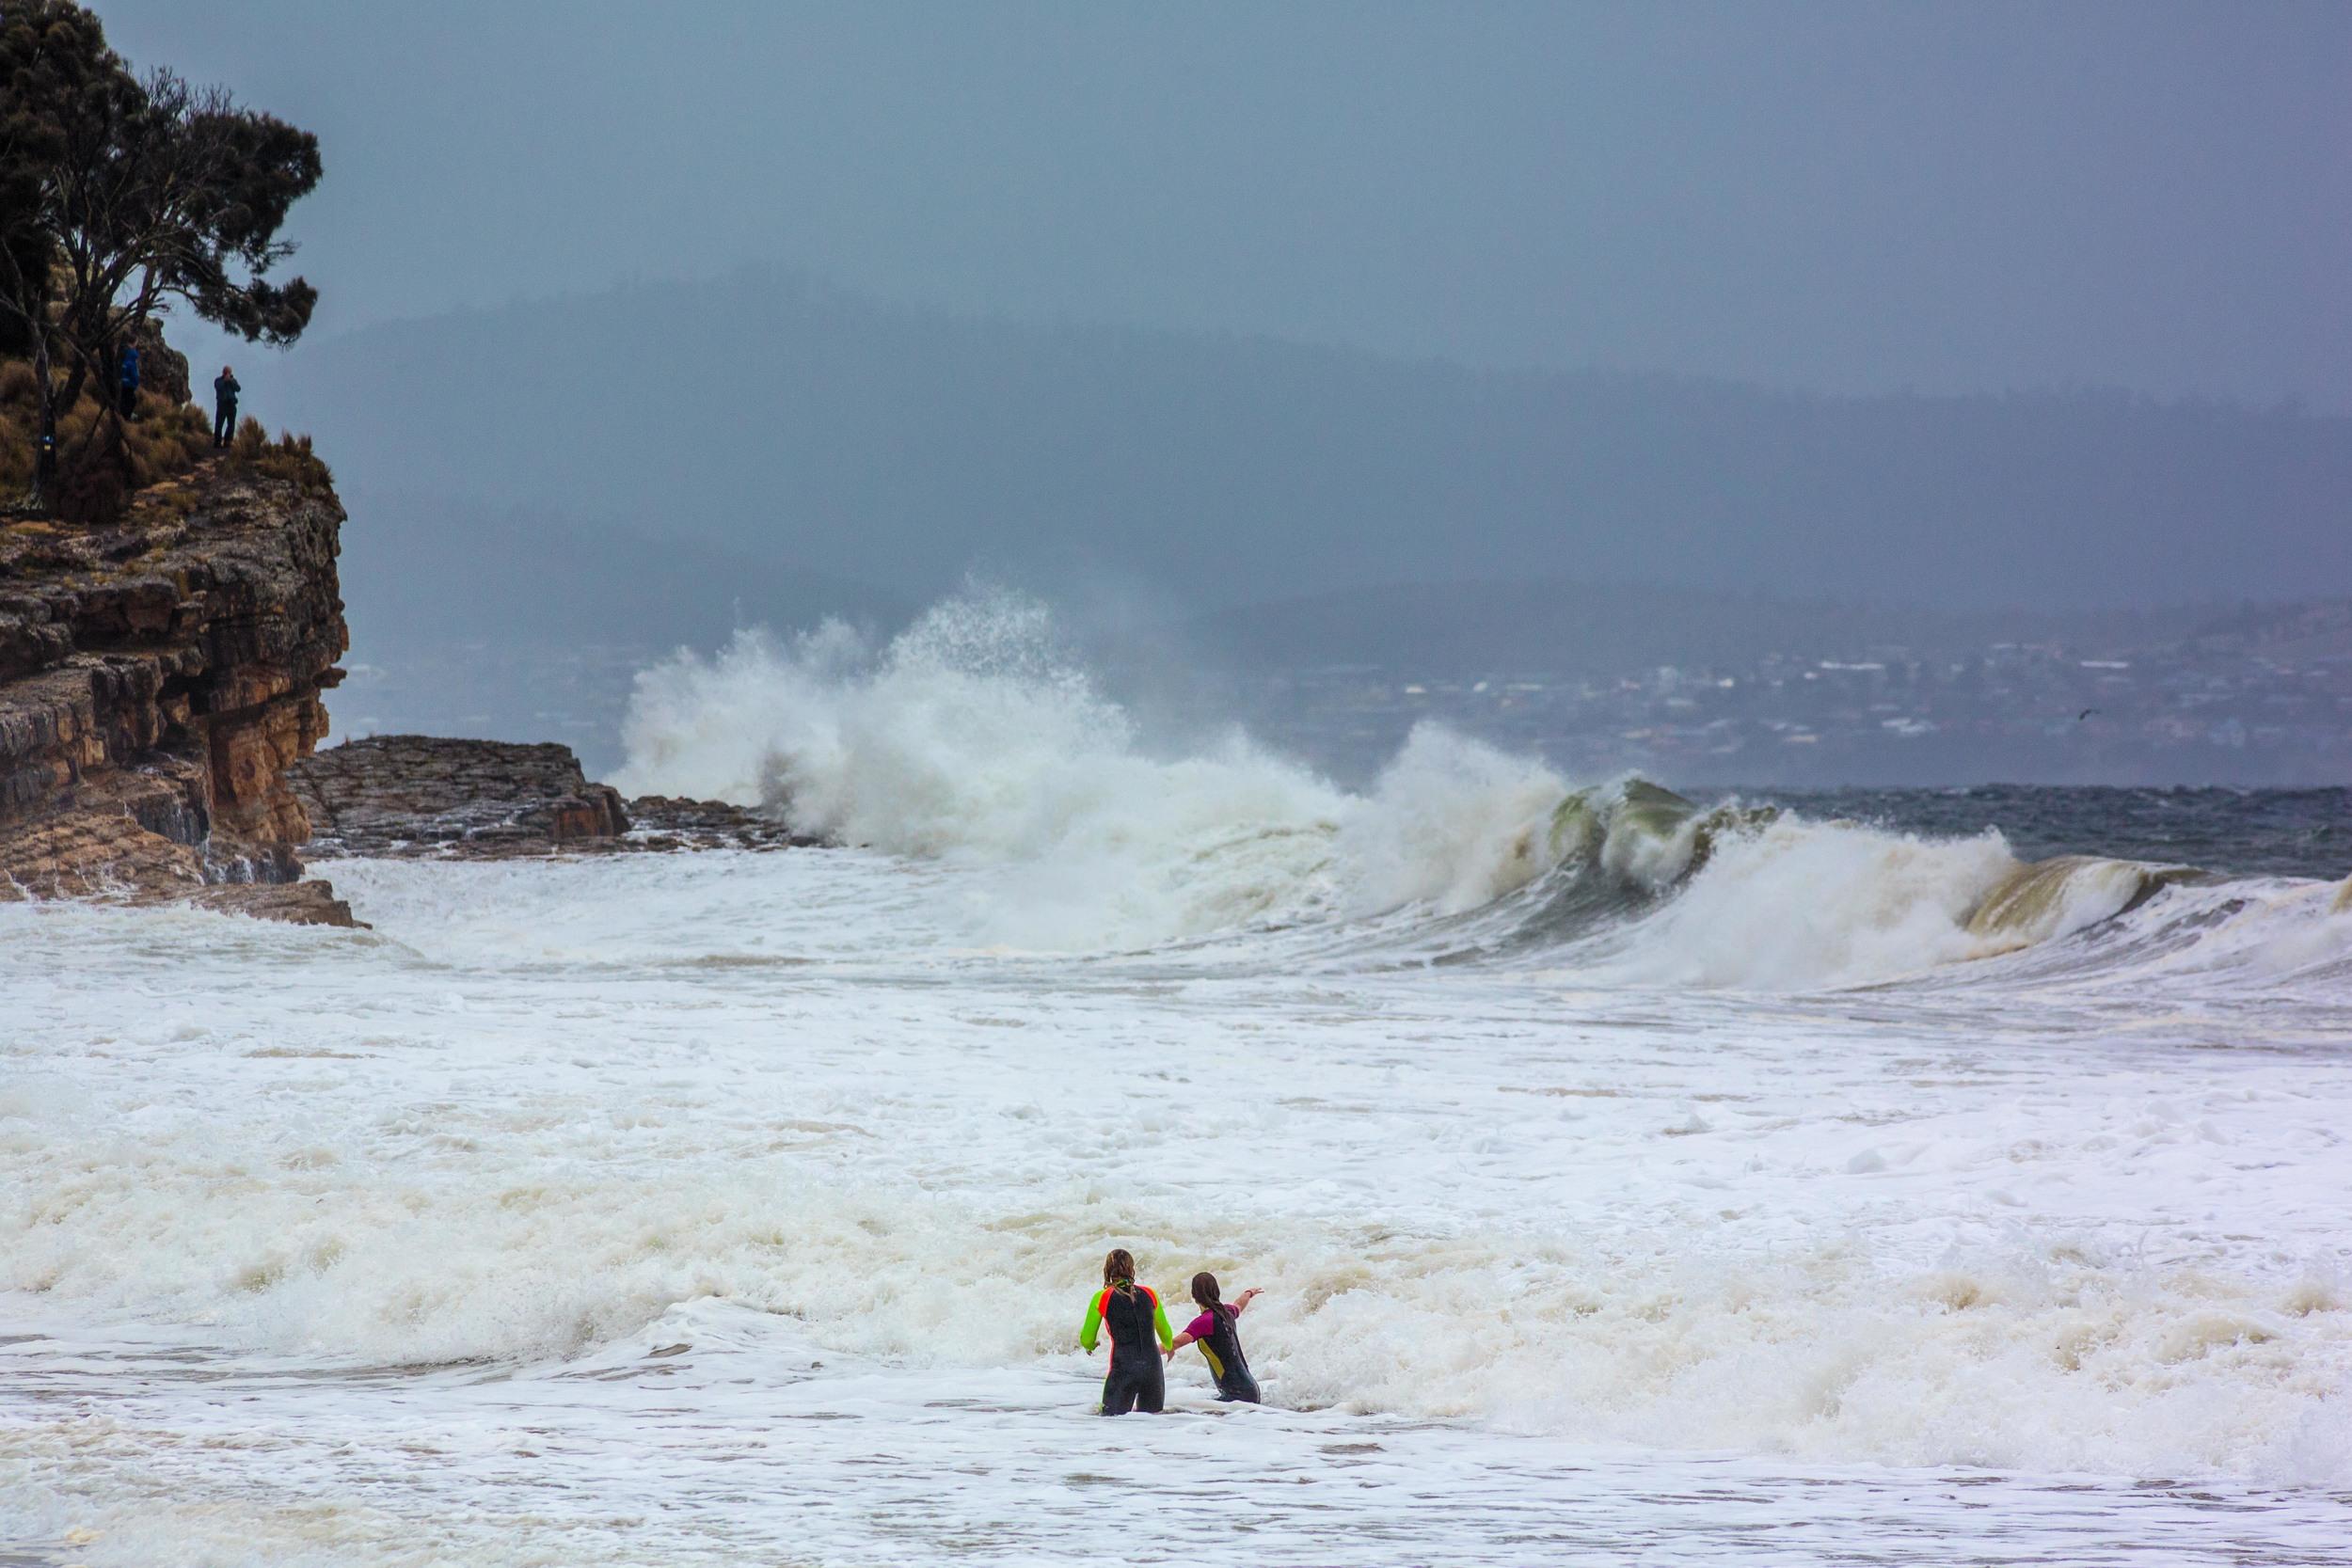 131124-Australia-Blackmans-Bay-Beach-125502-4-1311241.jpg